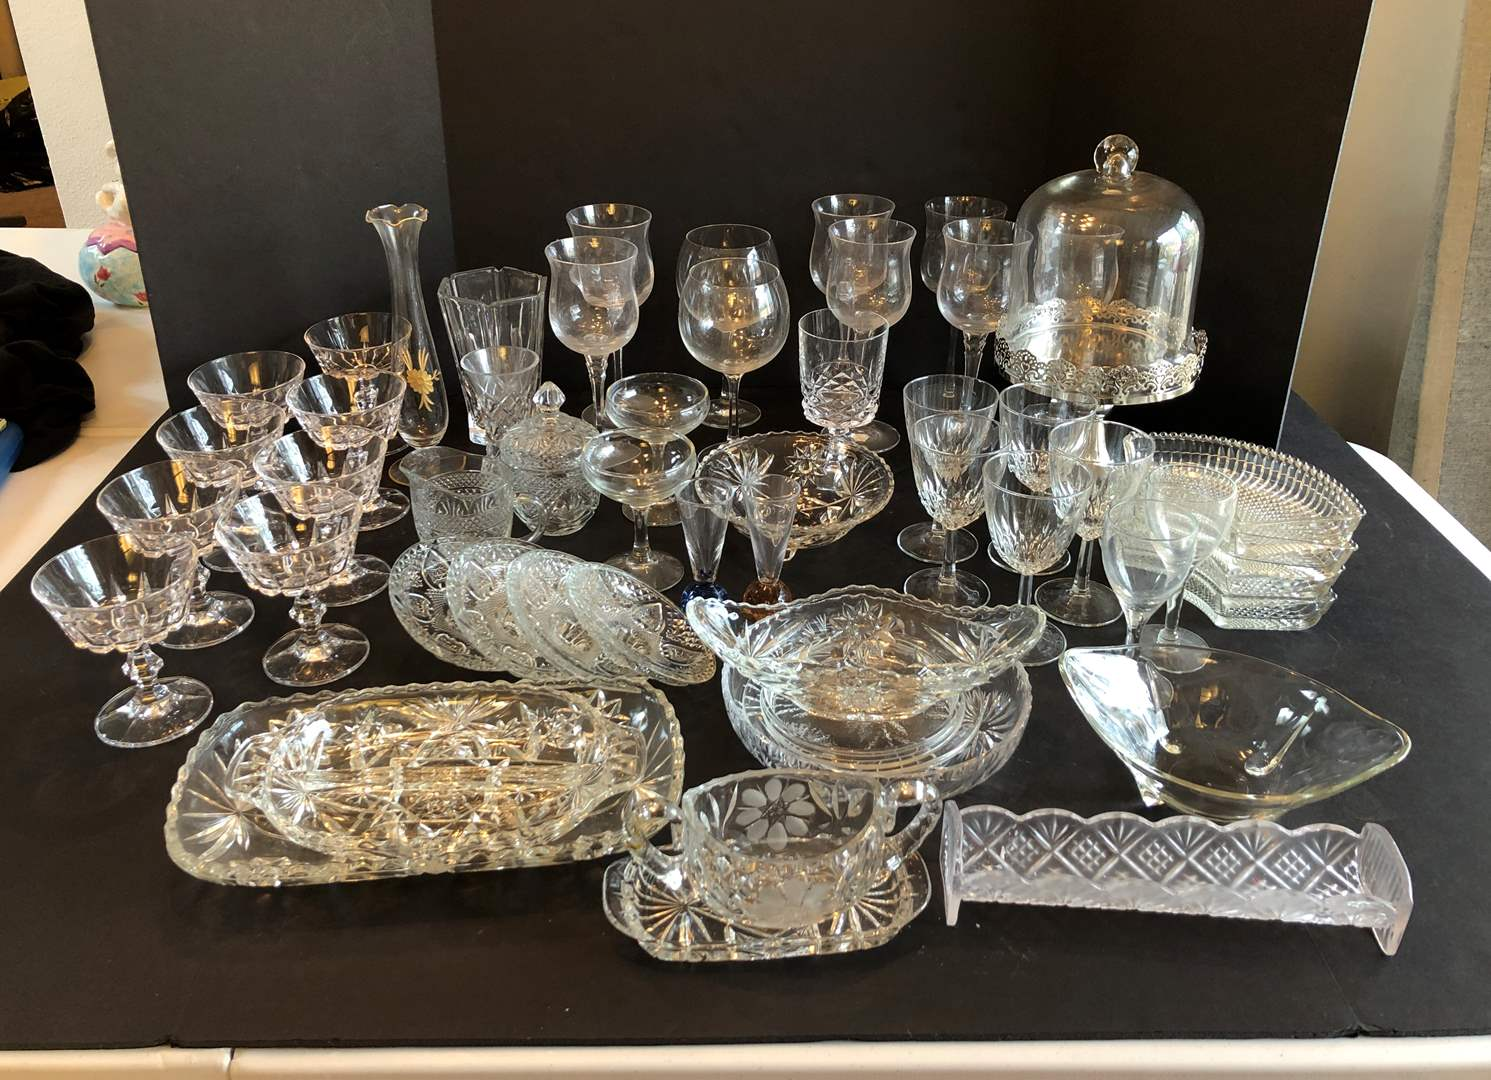 Lot # 125 - Large Selection of Stemware, Crystal Tidbits Trays, Cream & Sugar, Vases, Cake Stand & More..  (main image)